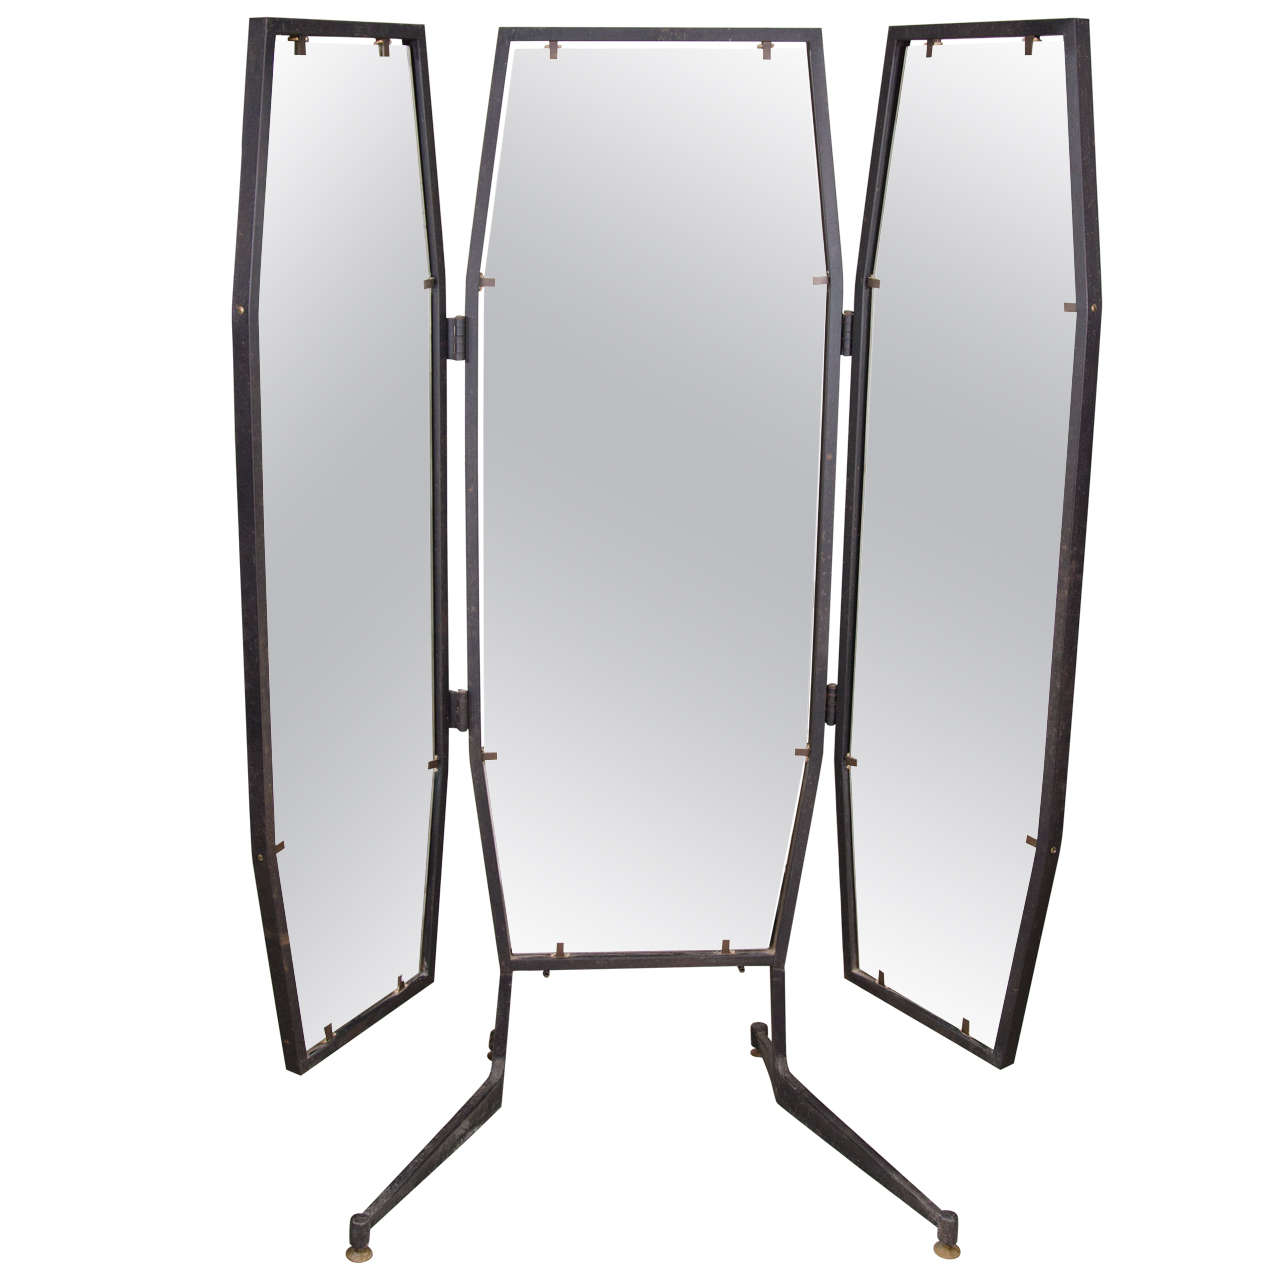 Full length three way italian mirror at 1stdibs for 6 foot floor mirror